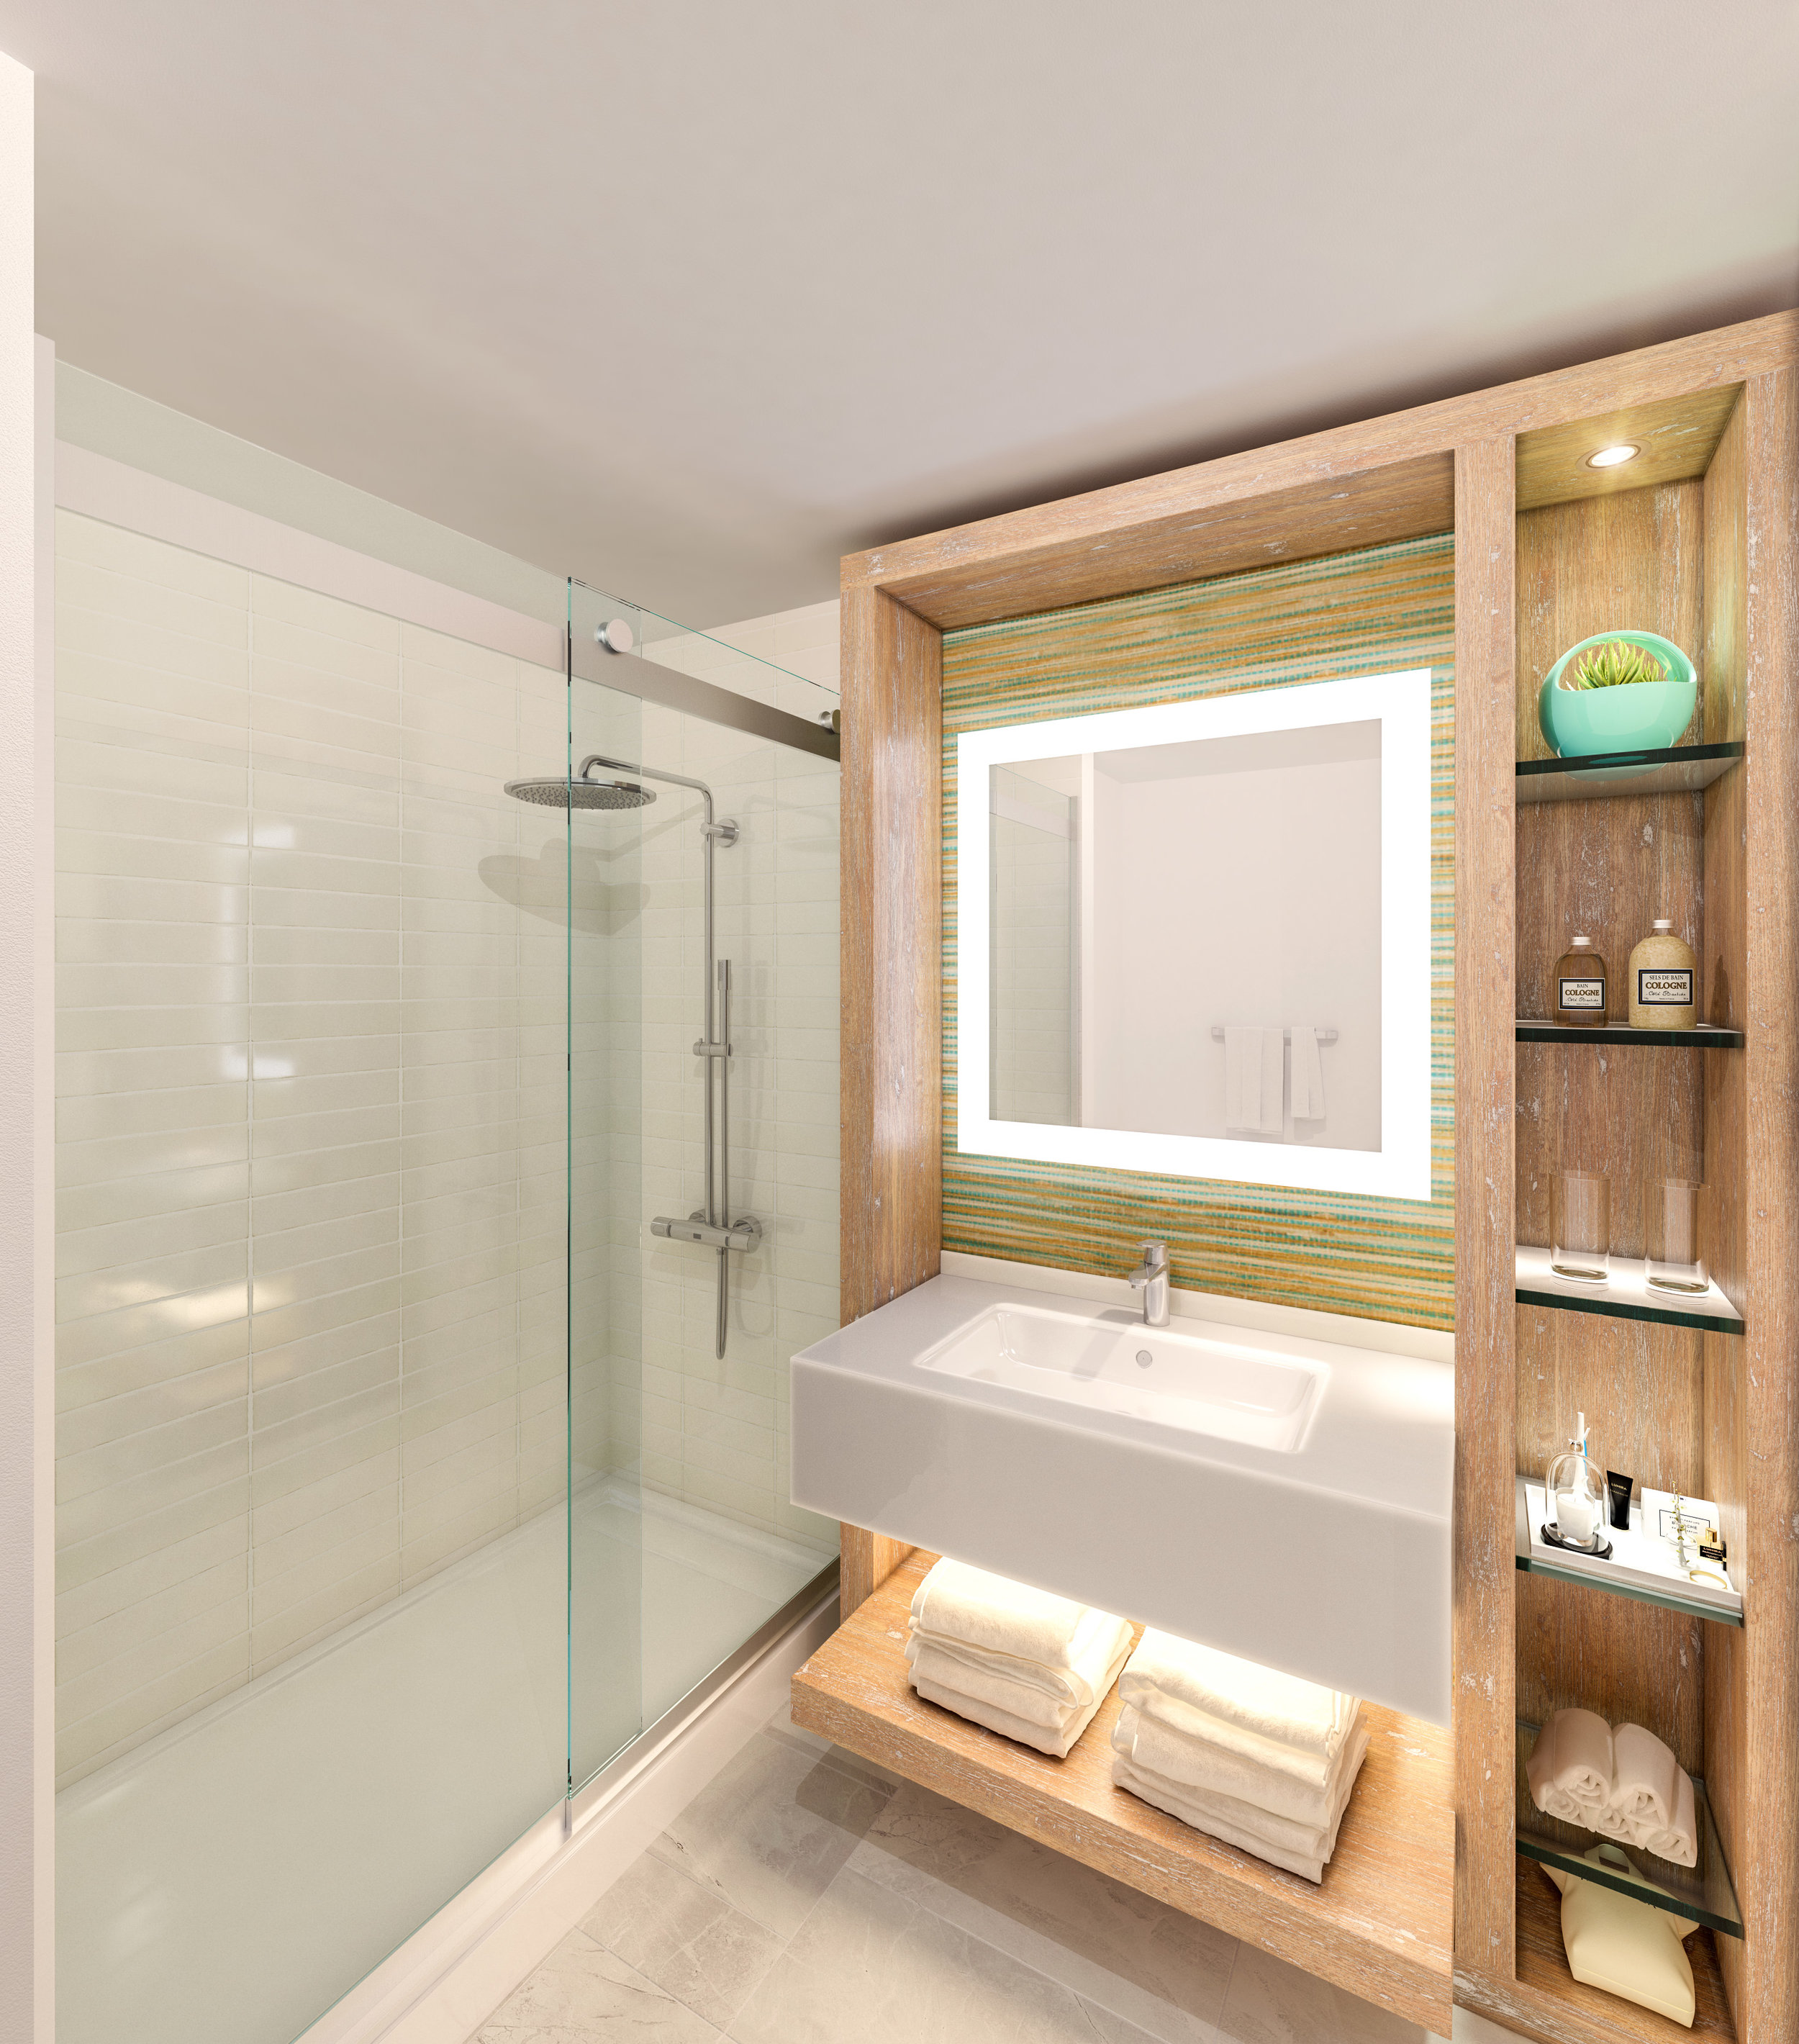 Bath Room at Delta Hotel Daytona Shores, in Daytona Beach, FL, Designed by Design Poole, Inc in Winter Park Florida